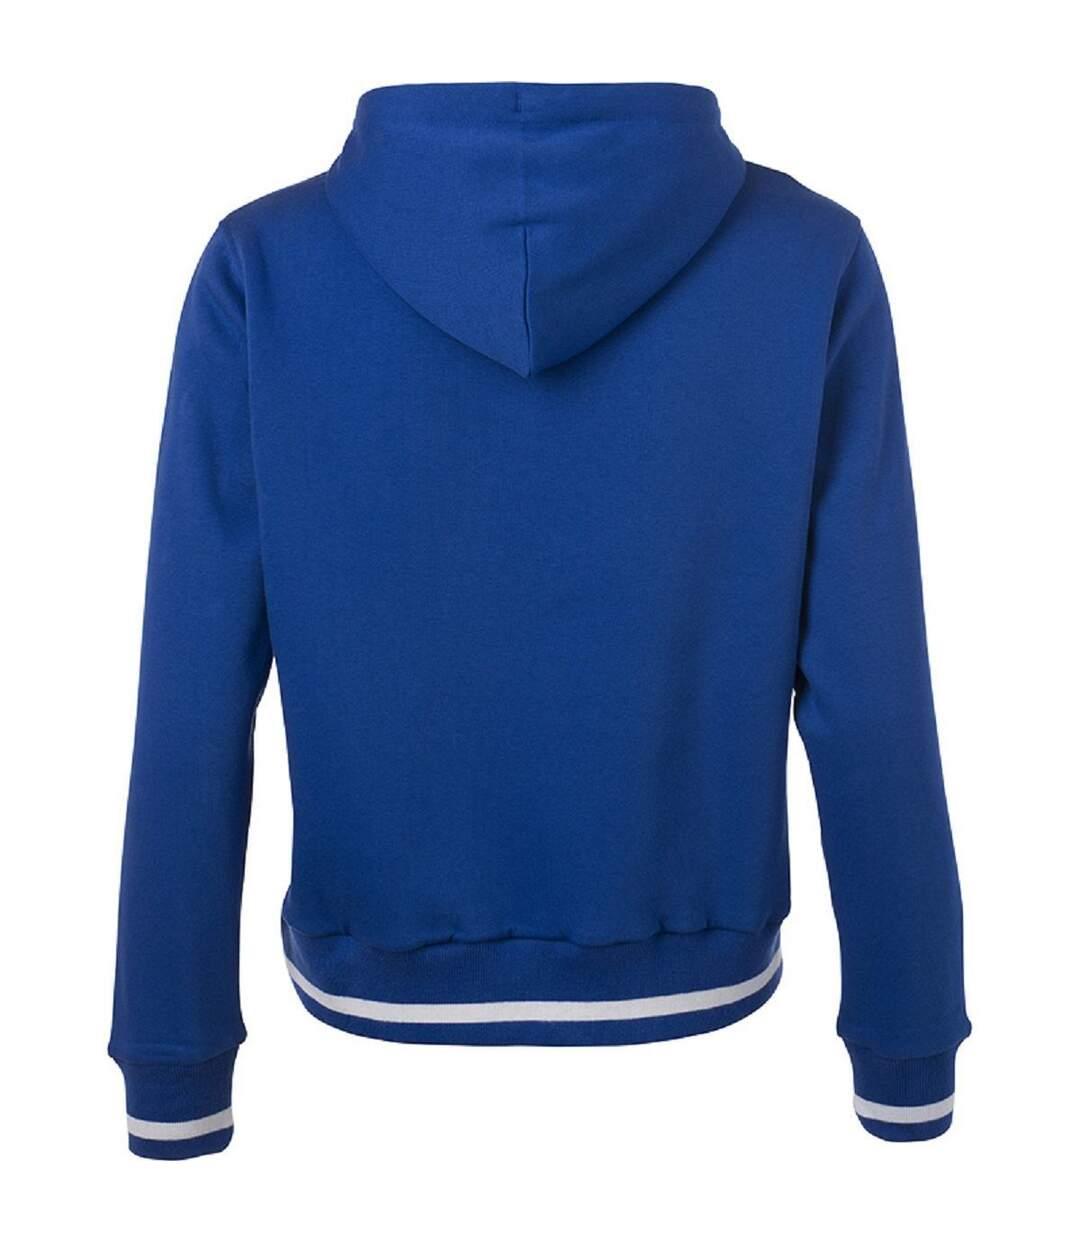 Dégagement Sweat shirt à capuche femme JN777 bleu roi dsf.d455nksdKLFHG